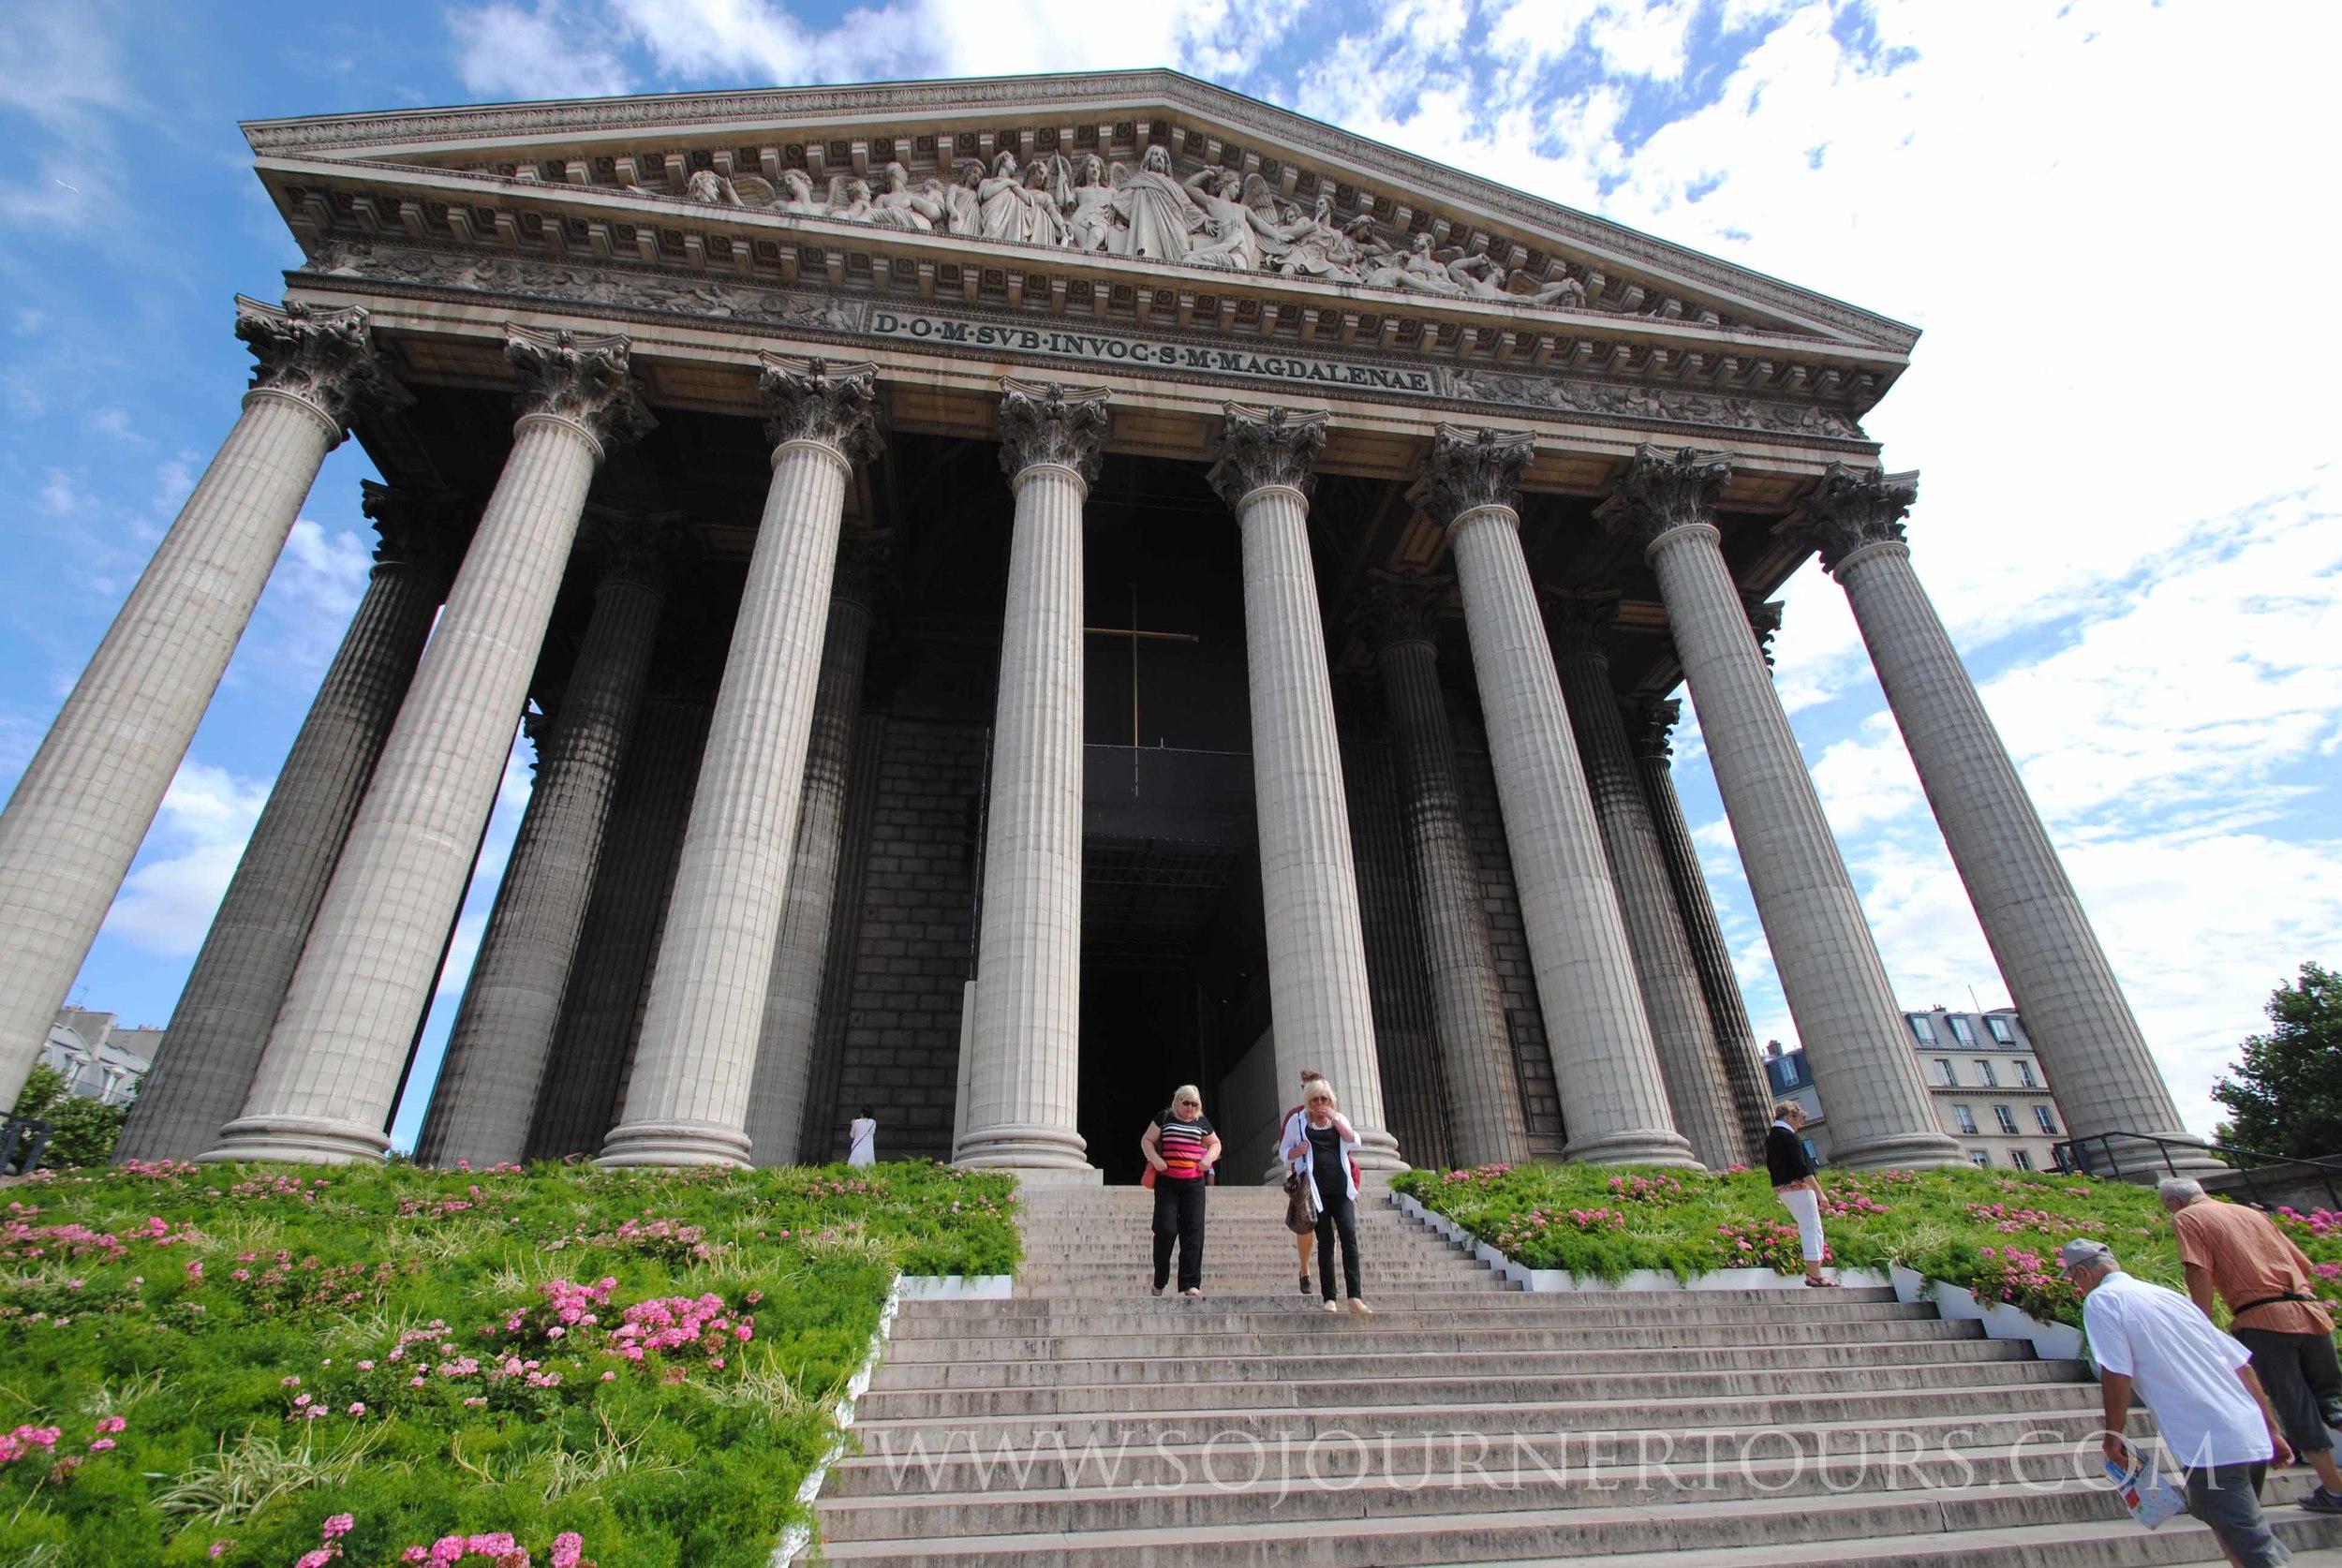 Eglise Madeleine: Paris, France (Sojourner Tours)